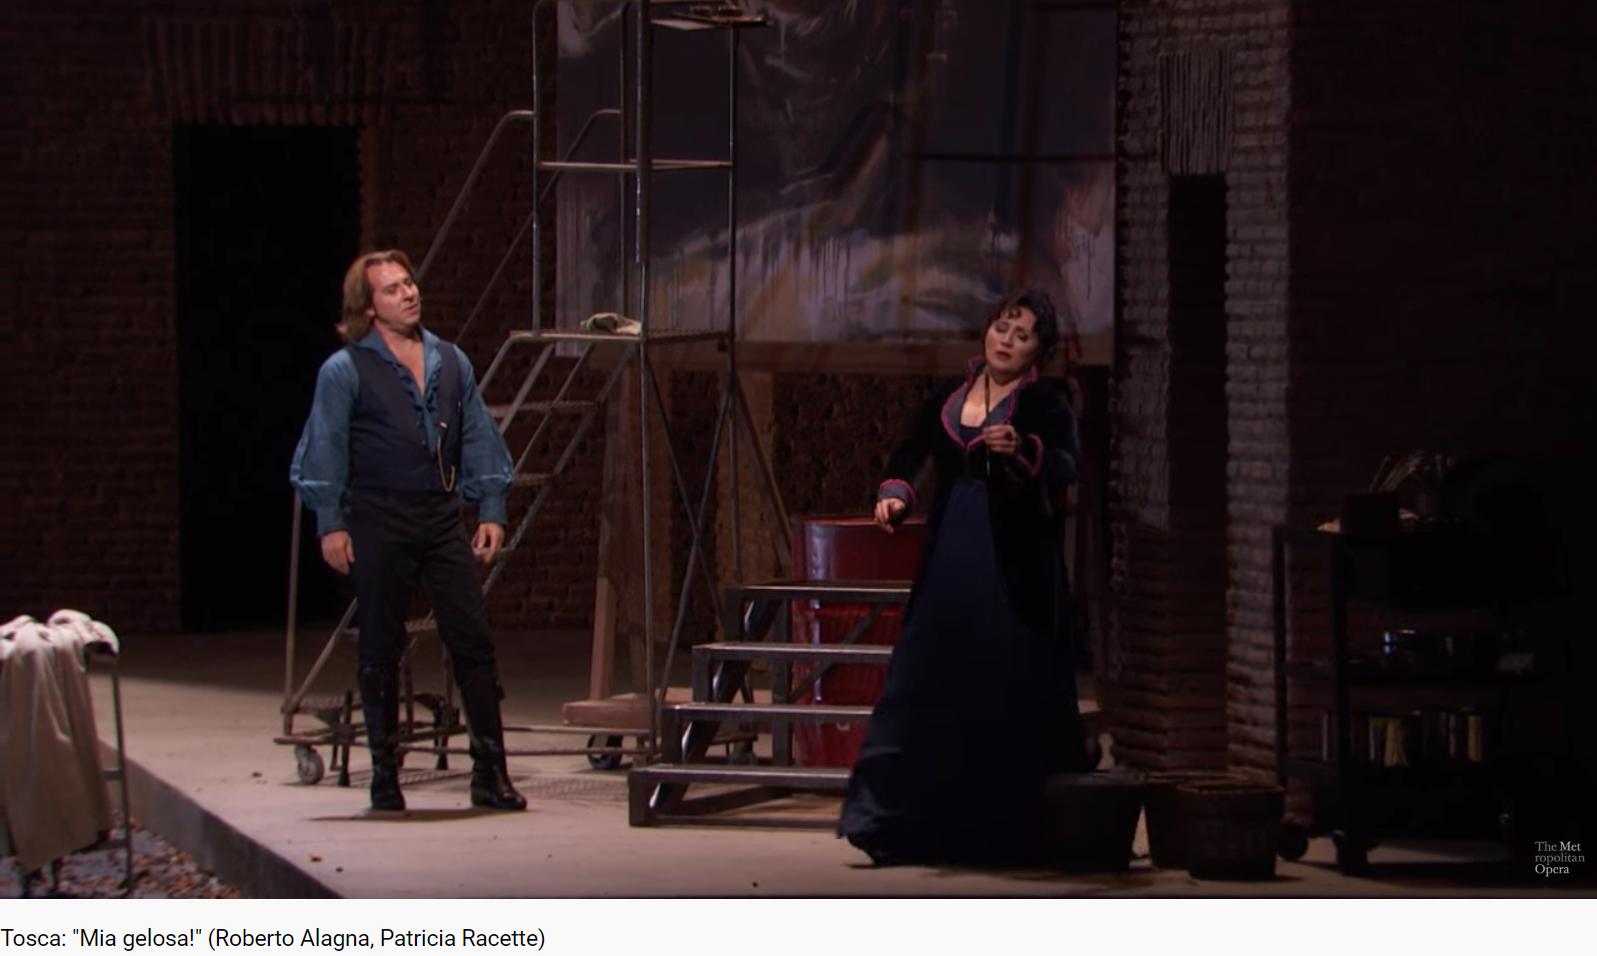 Puccini Tosca mia gelosa (MET 2013)